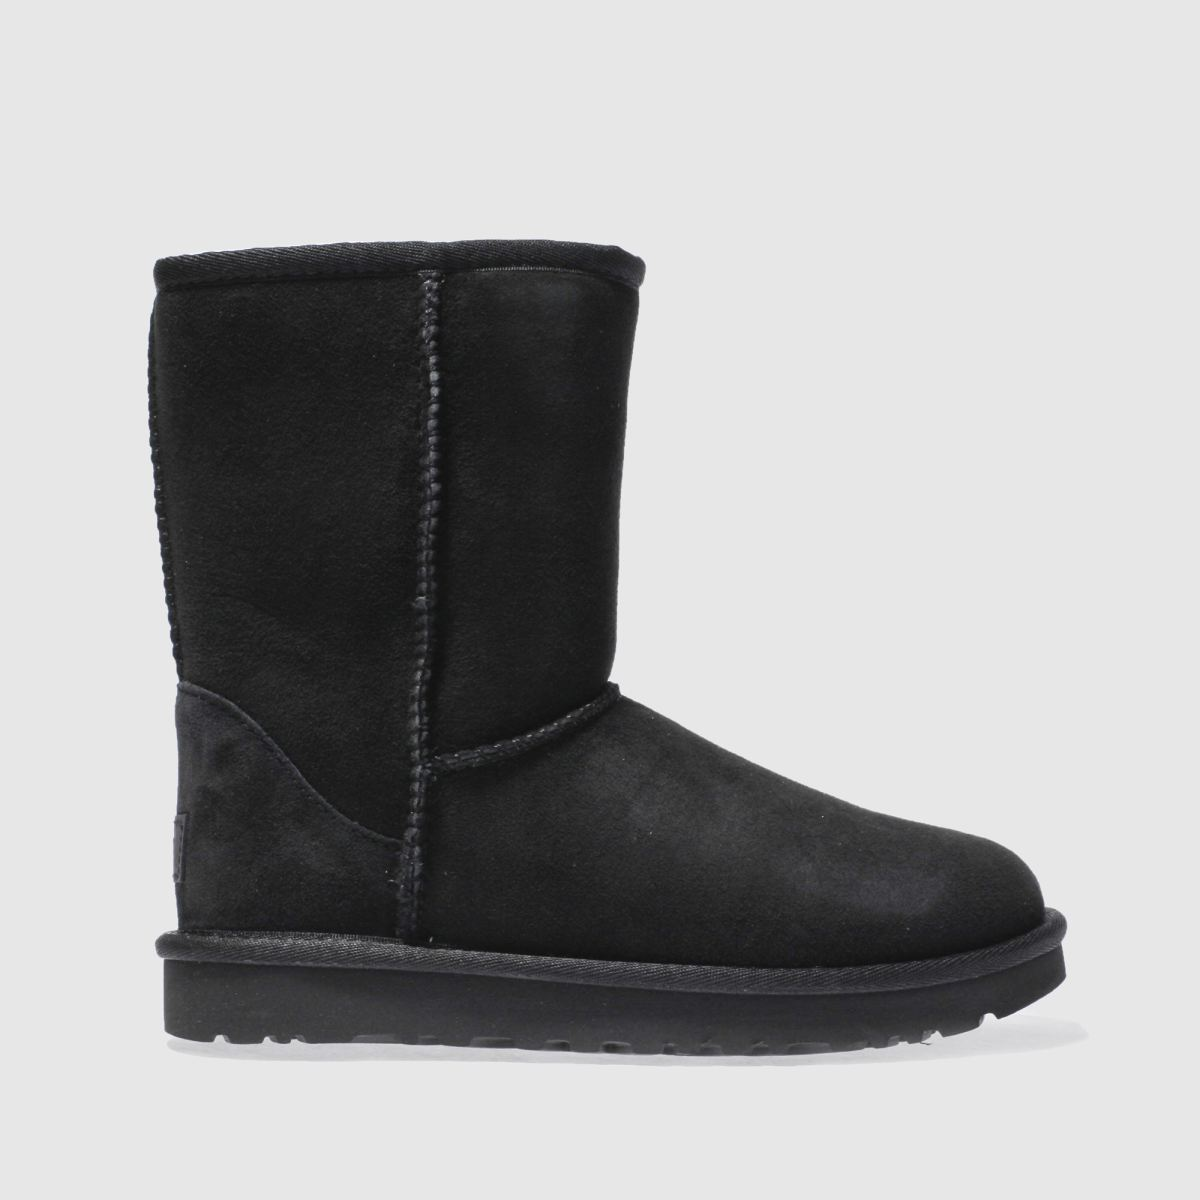 Womens Black Ugg Classic Short Ii Boots Schuh